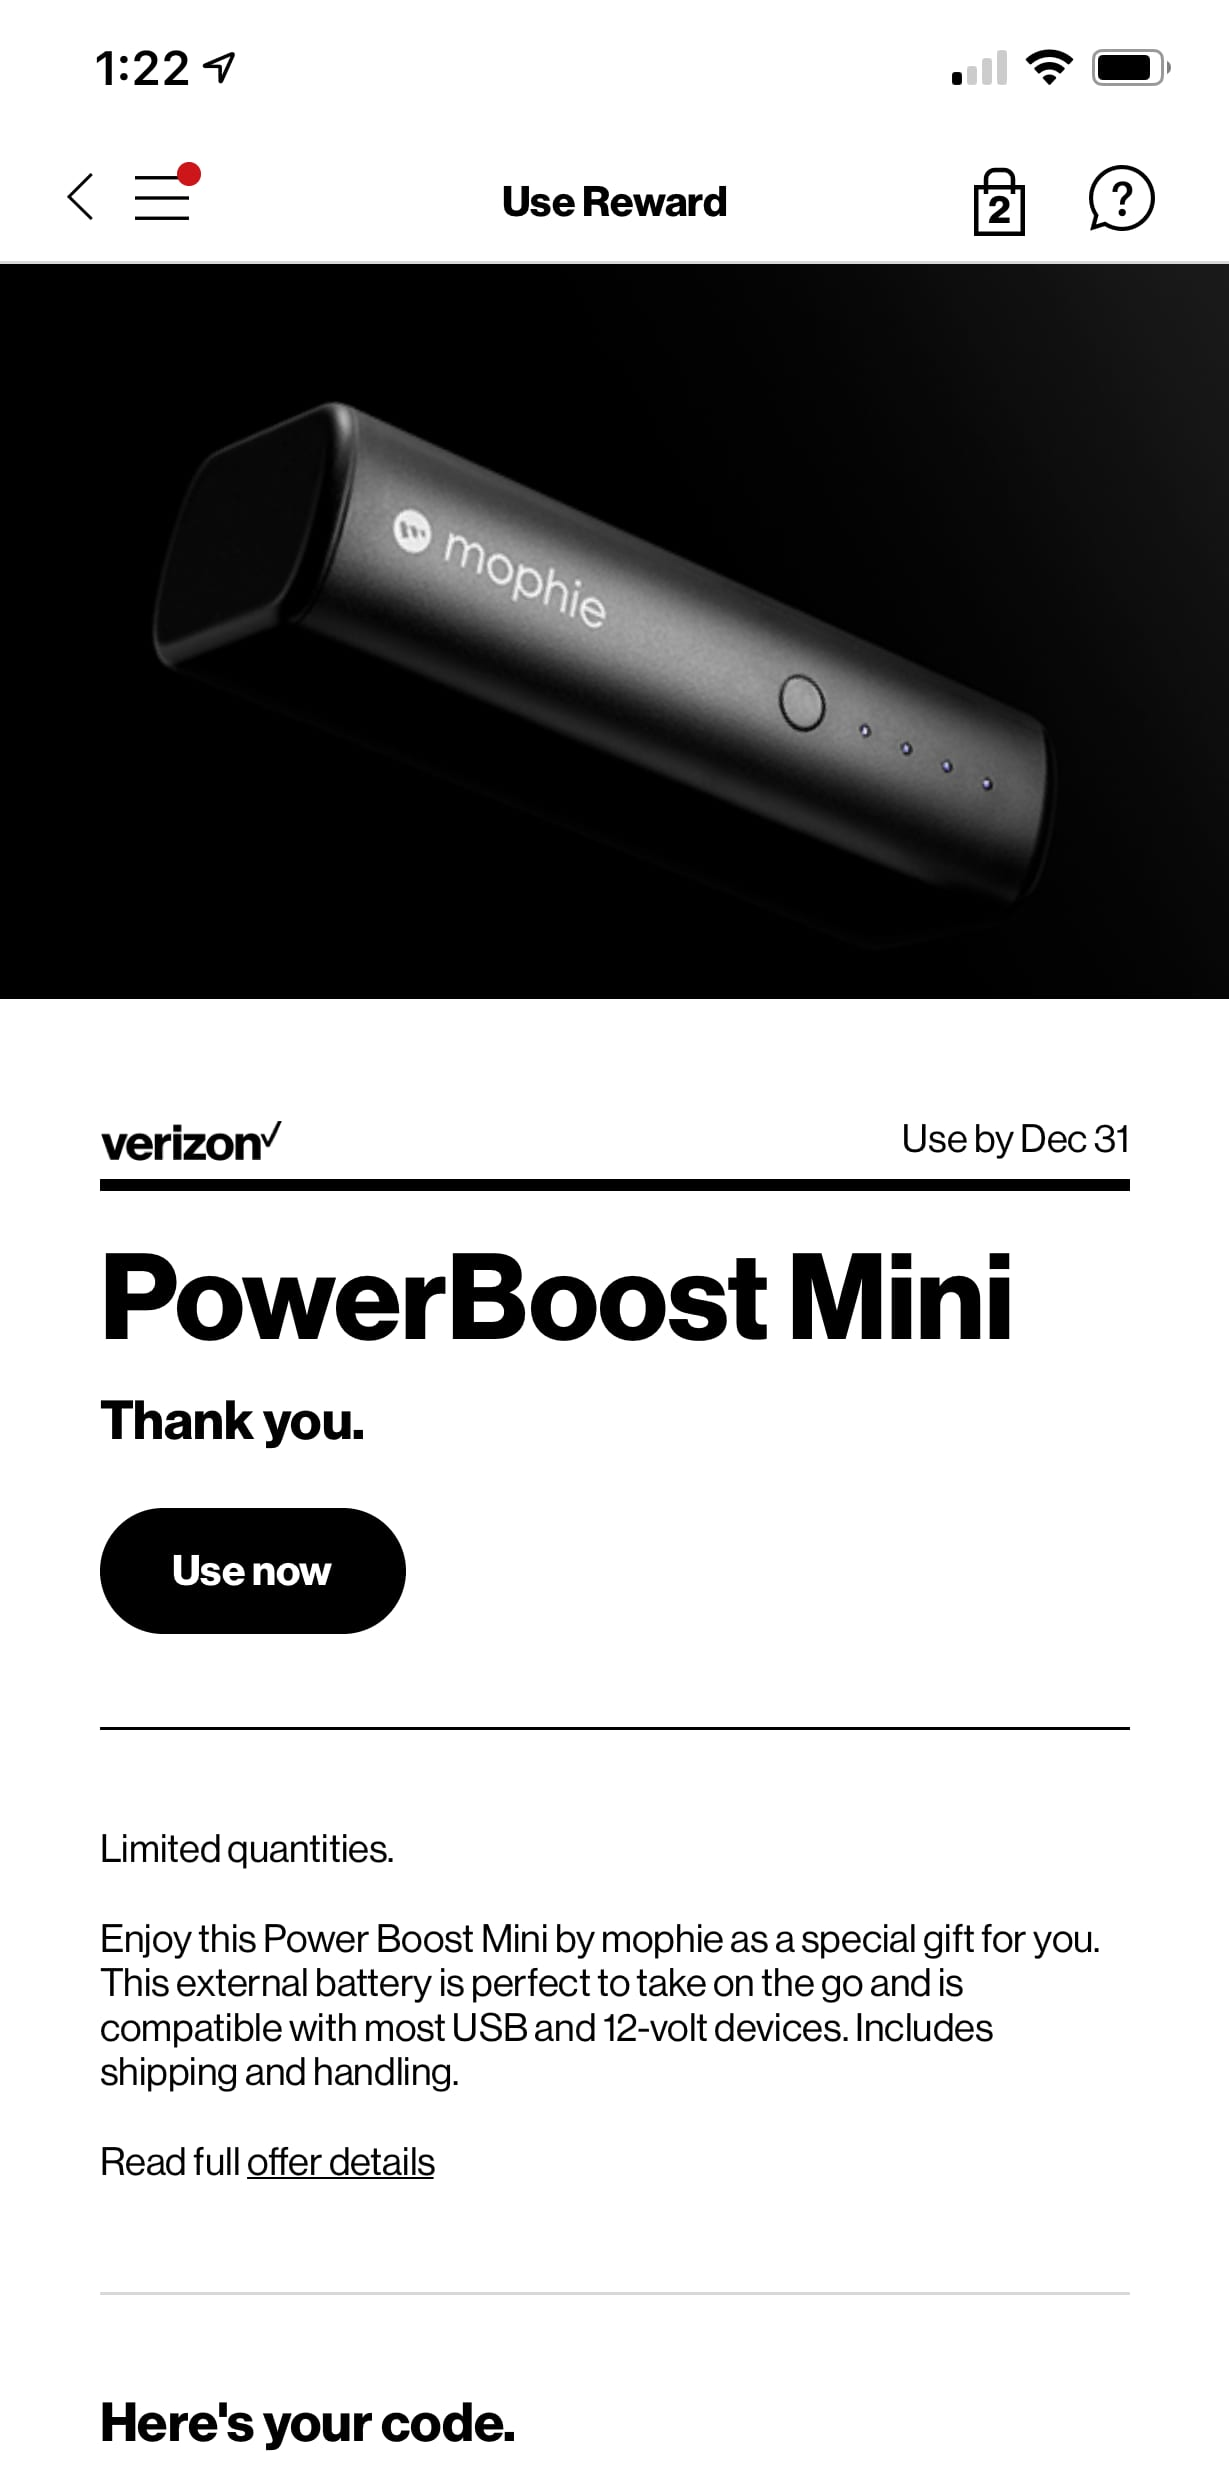 VerizonUp Rewards - Free PowerBoost Mini YMMV